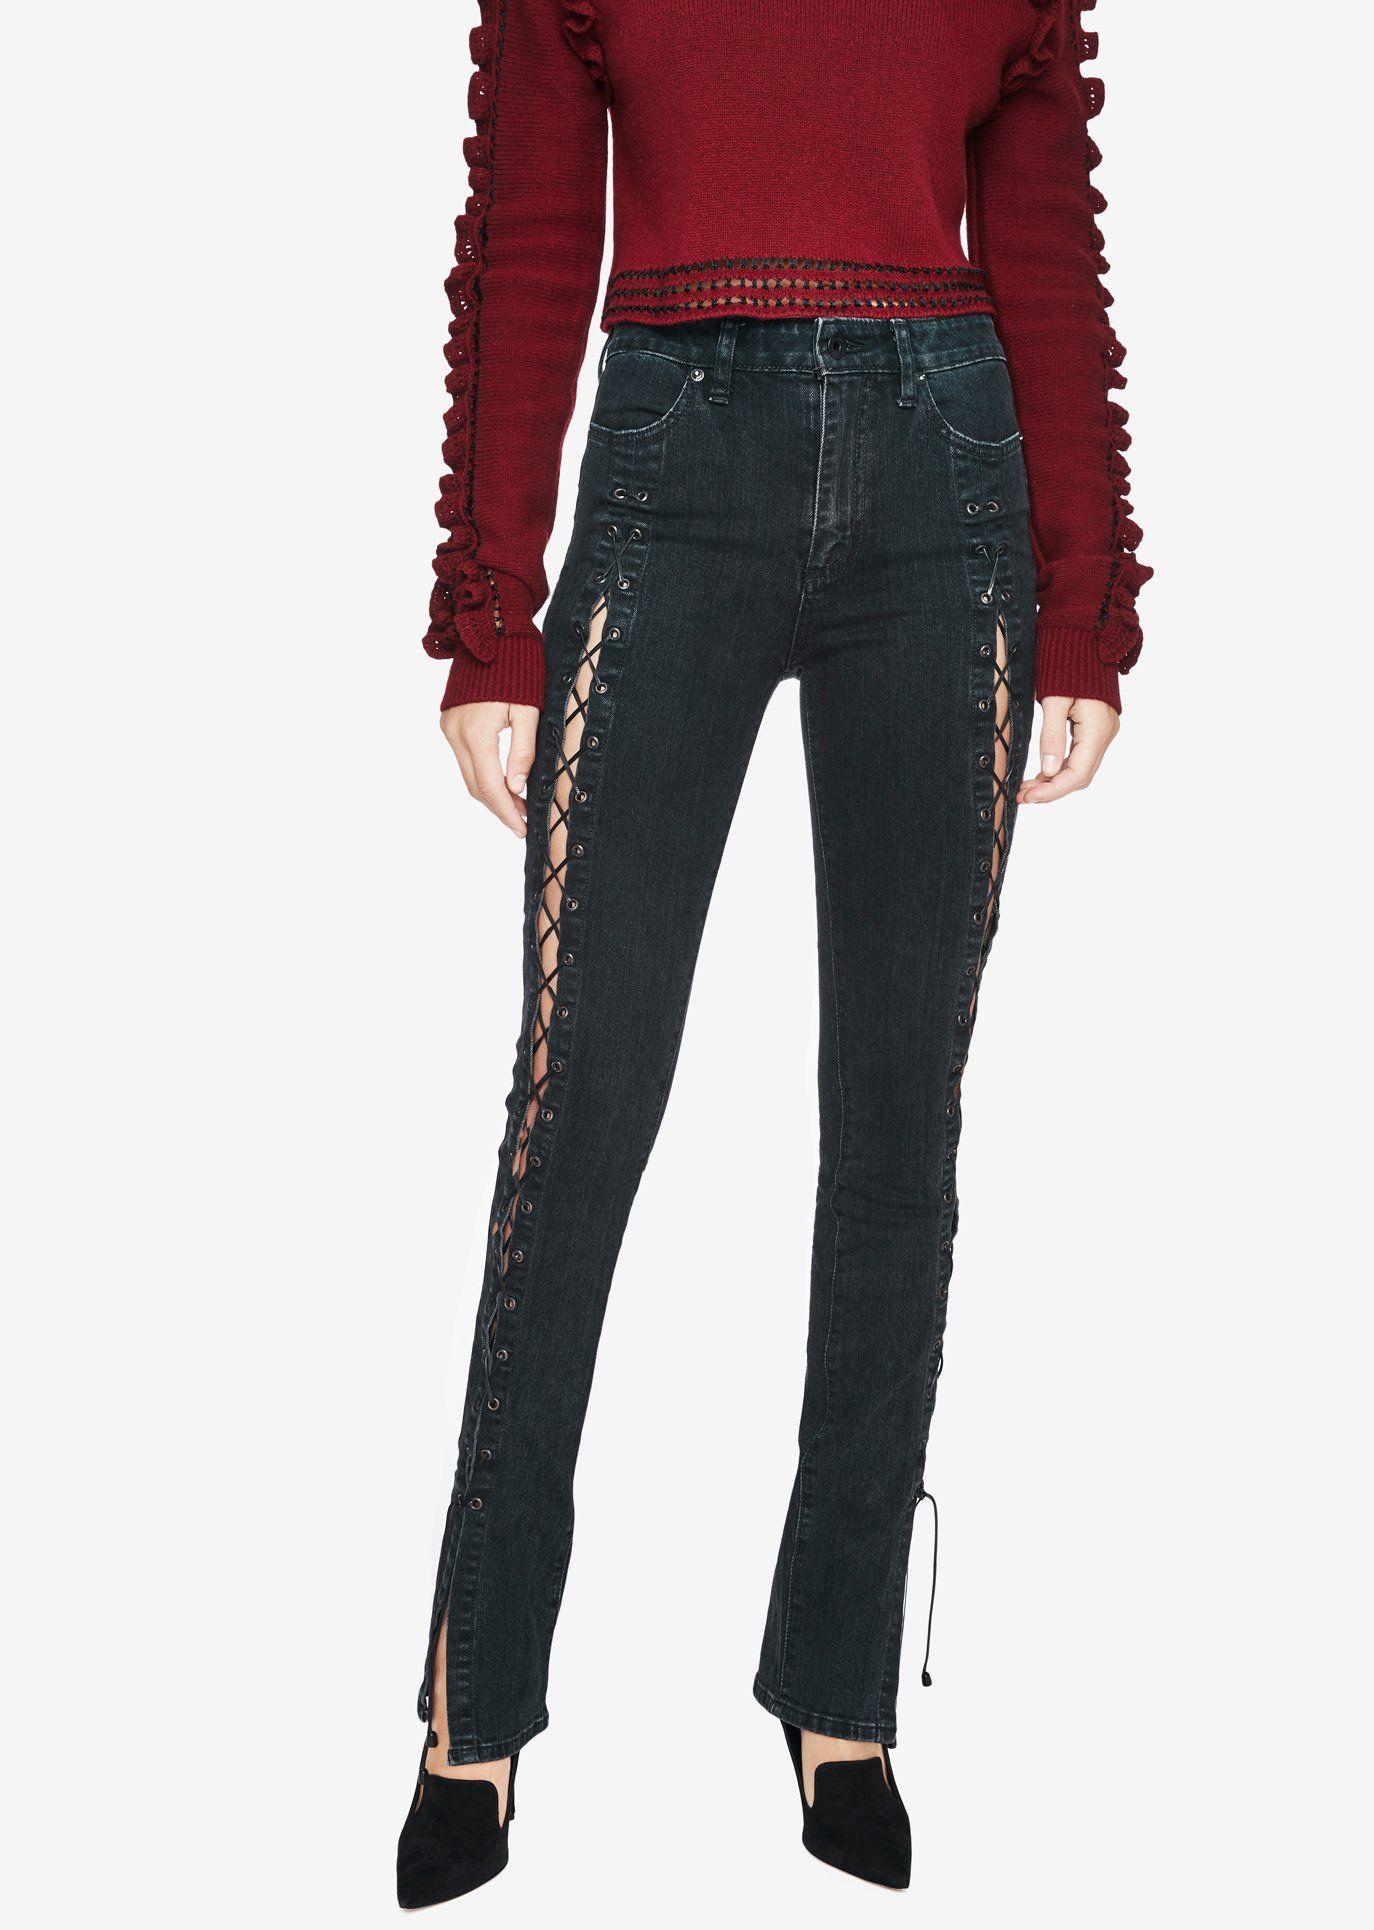 9ec92e5fcc2 Lace-Up Stove Pipe Jeans